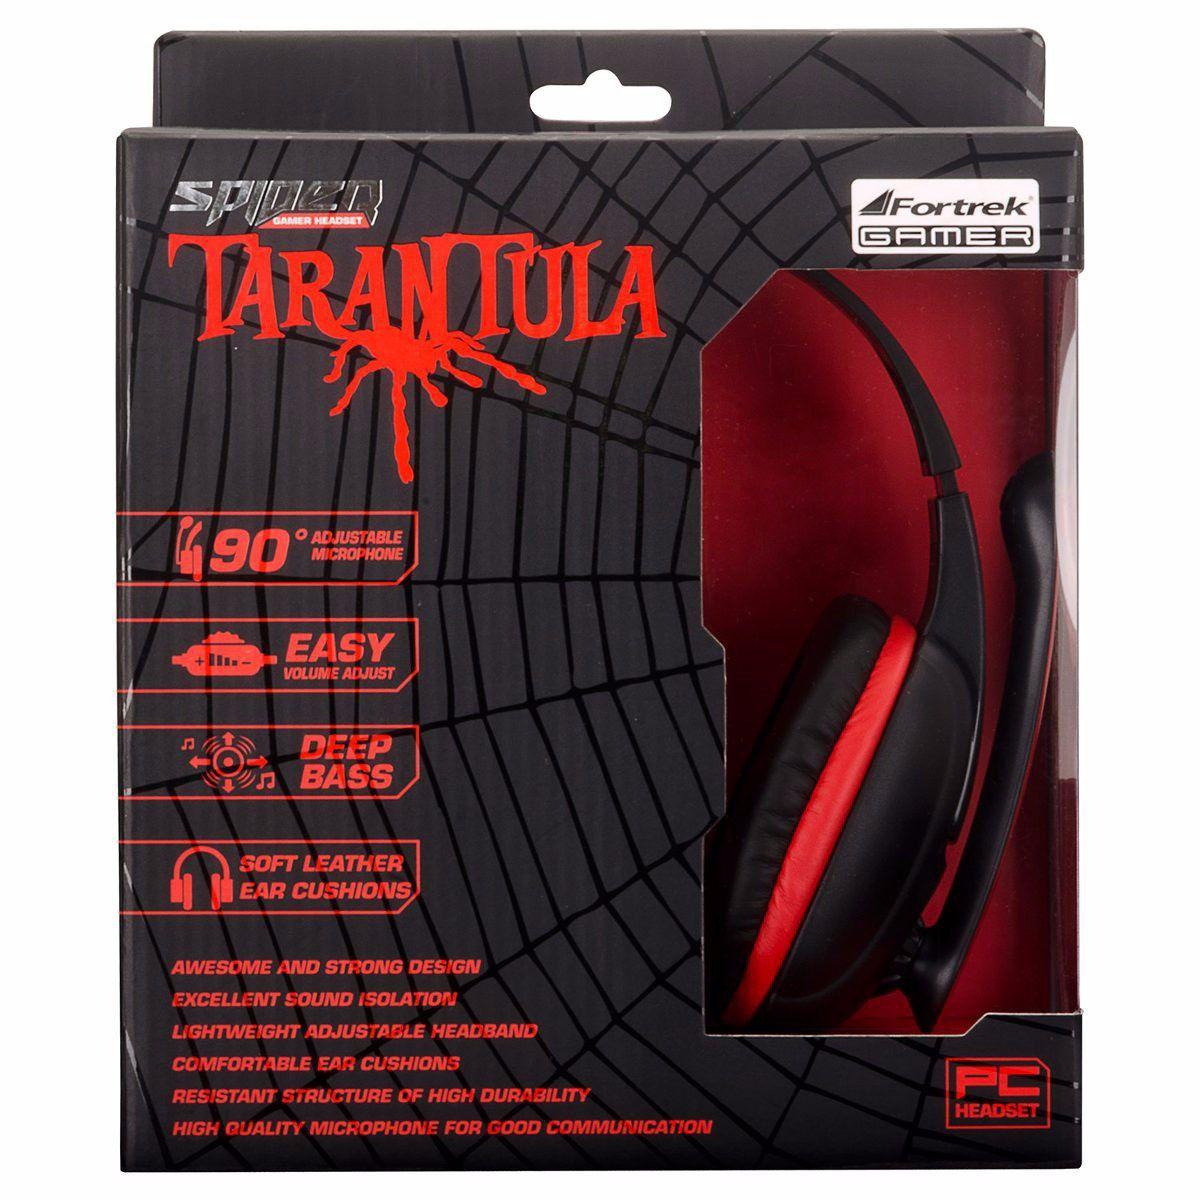 Headset Gamer Spider Tarantula PC/XBOX 360 SHS-702 Fortrek